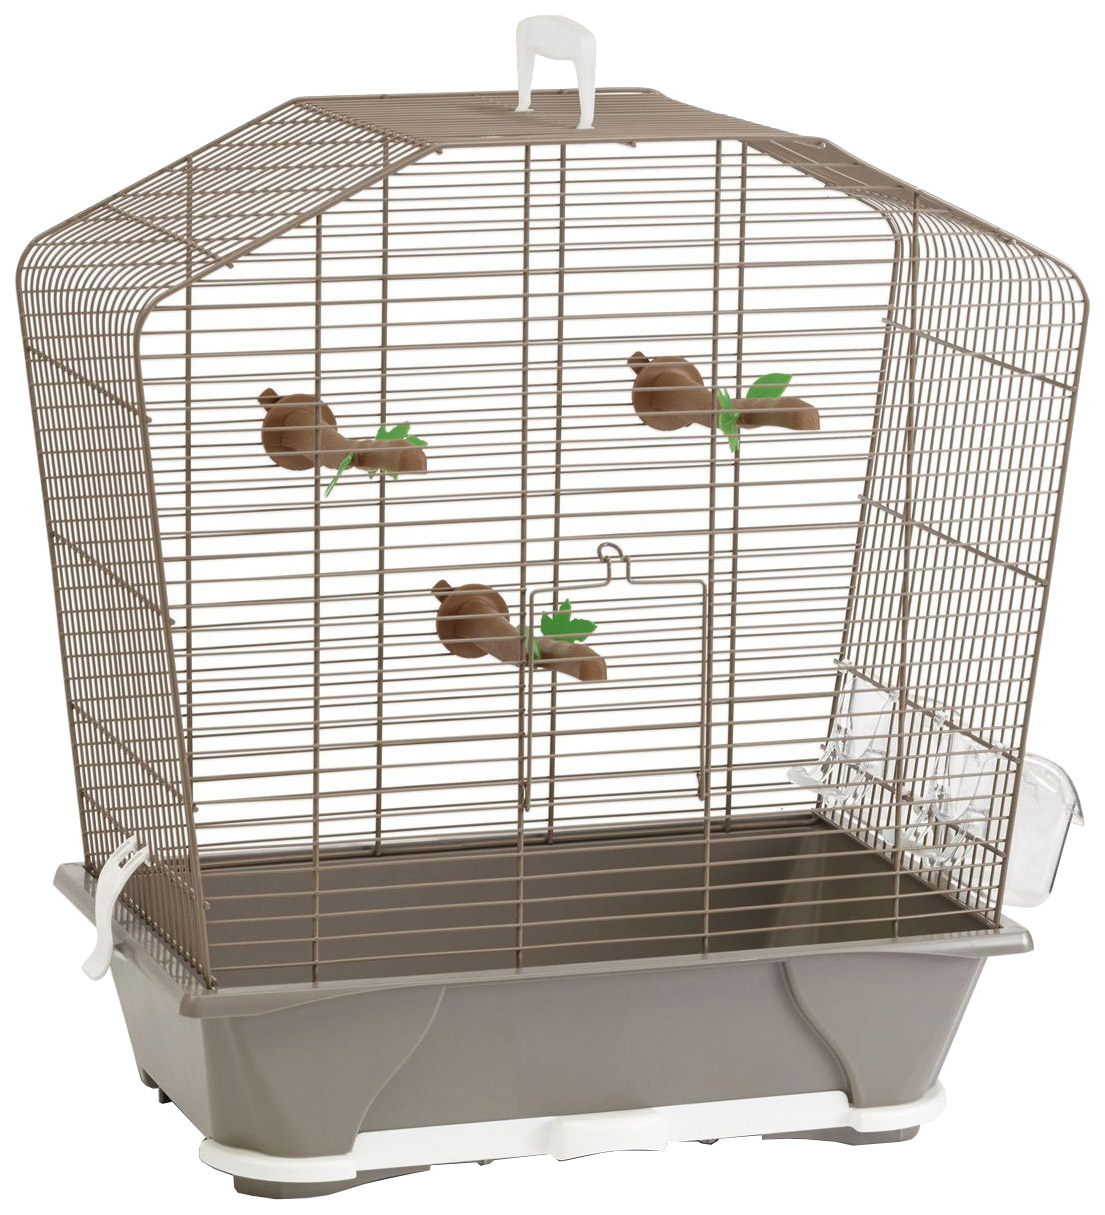 Клетка для птиц Savic Camille 30, бежевая,